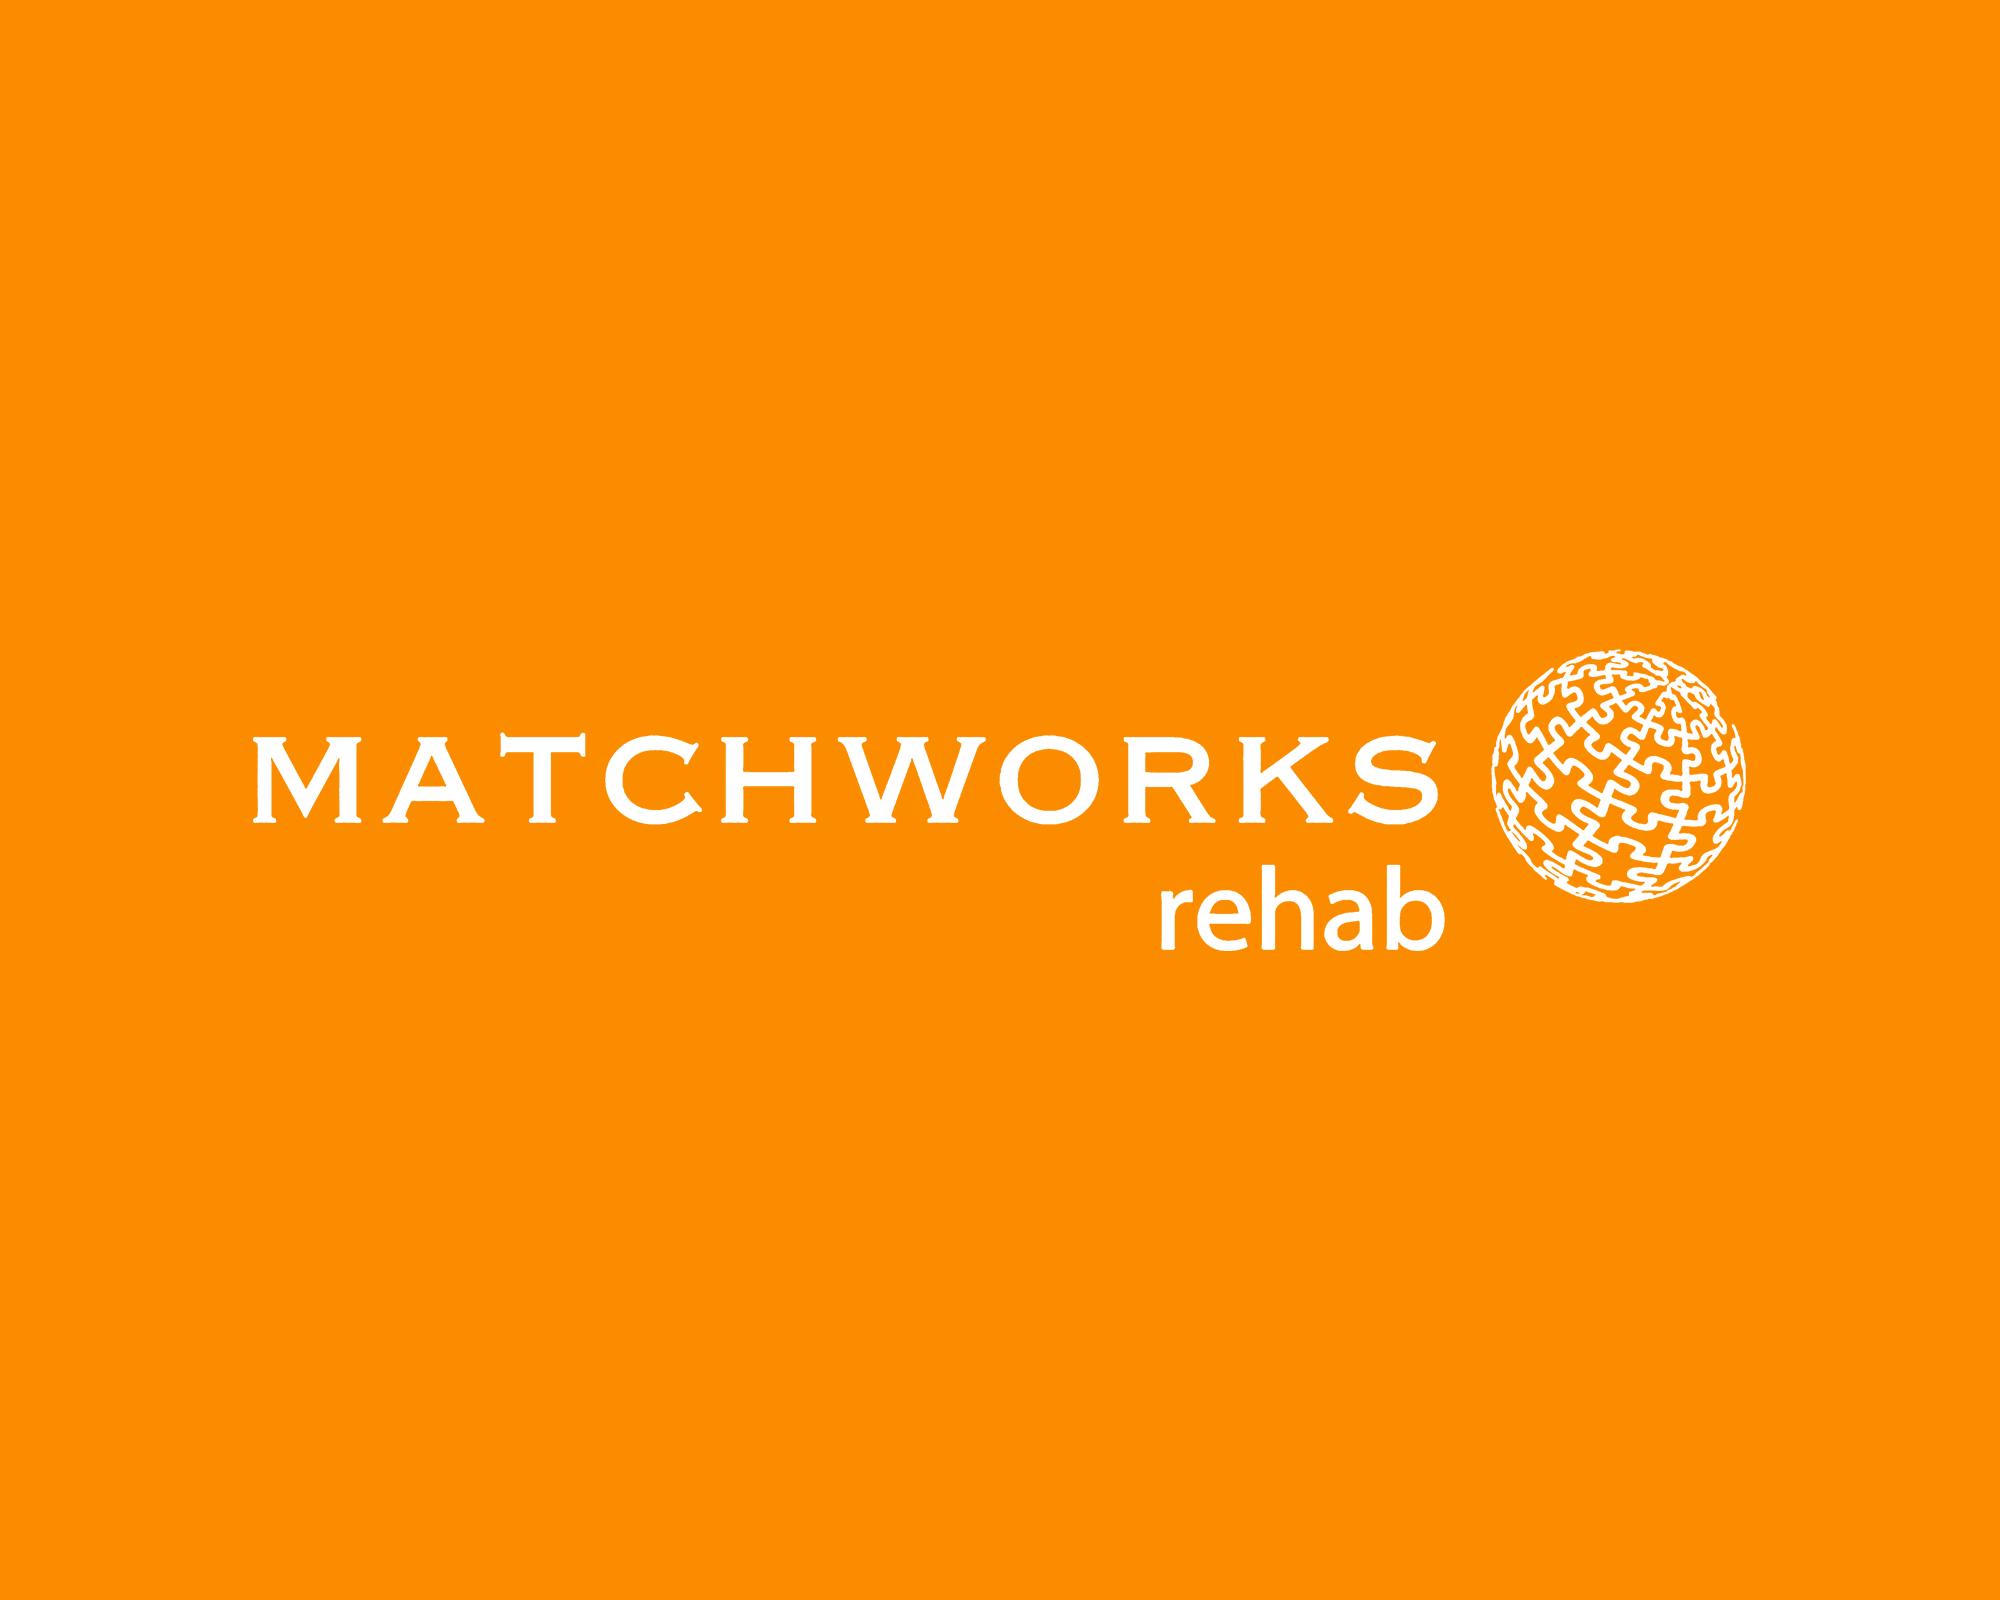 matchworks rehab Logo